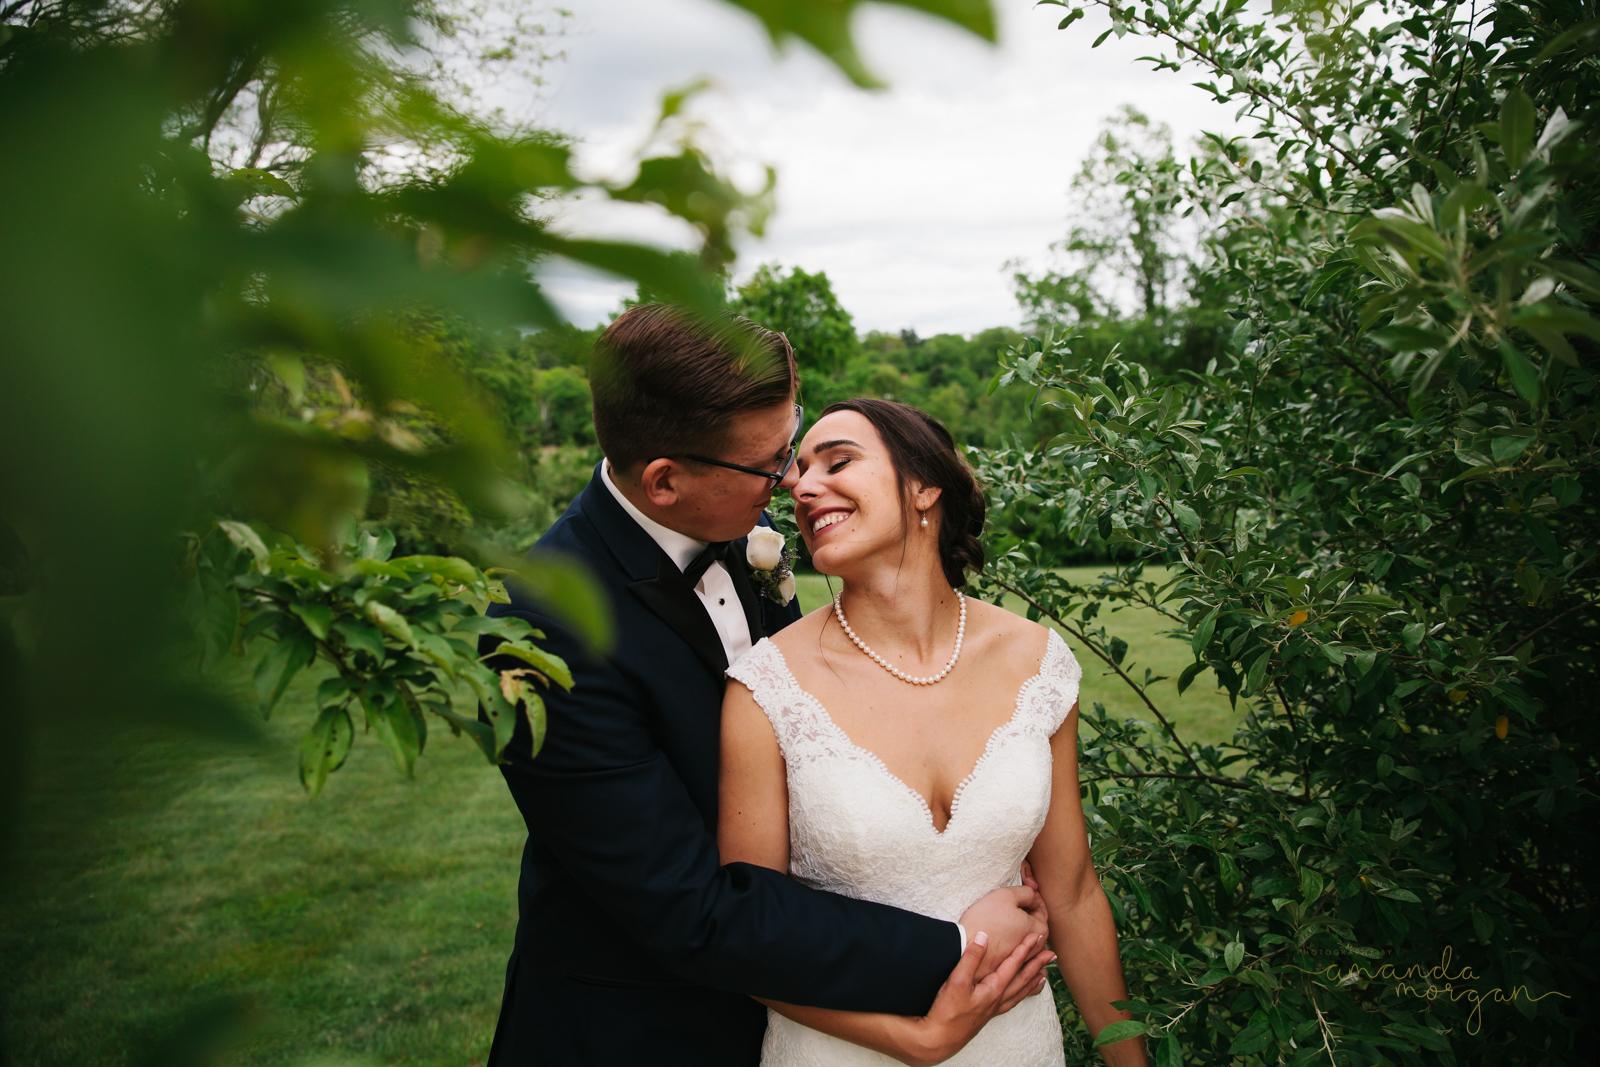 Publick-House-Wedding-Amanda-Morgan-27.jpg